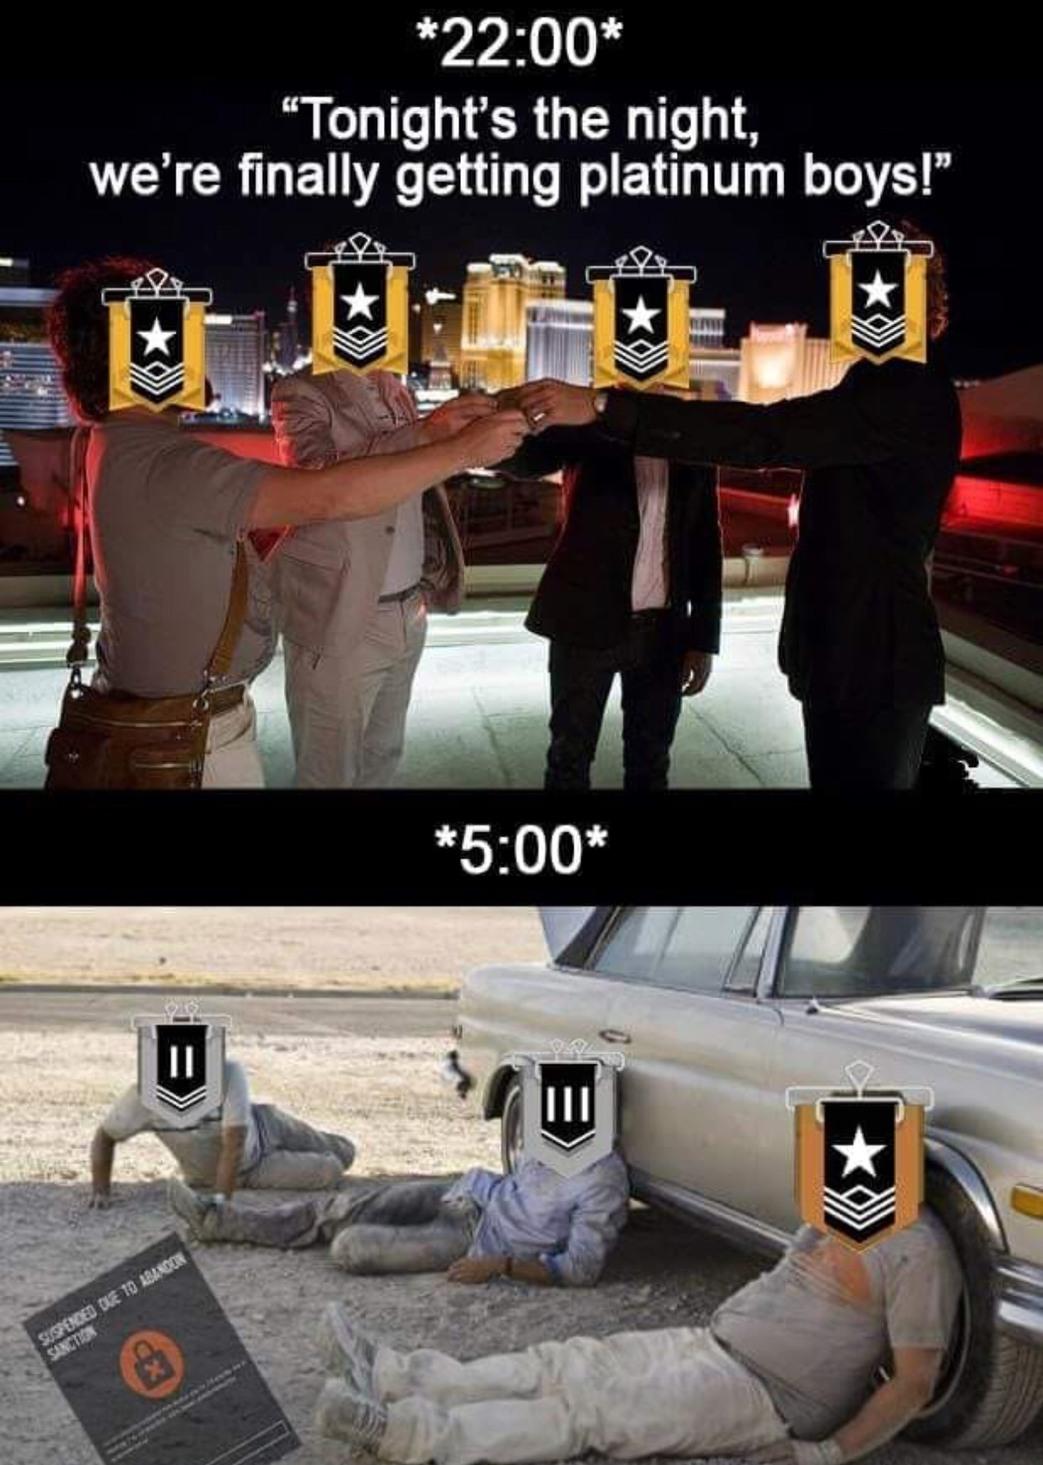 PUTA TRISTEZA - meme